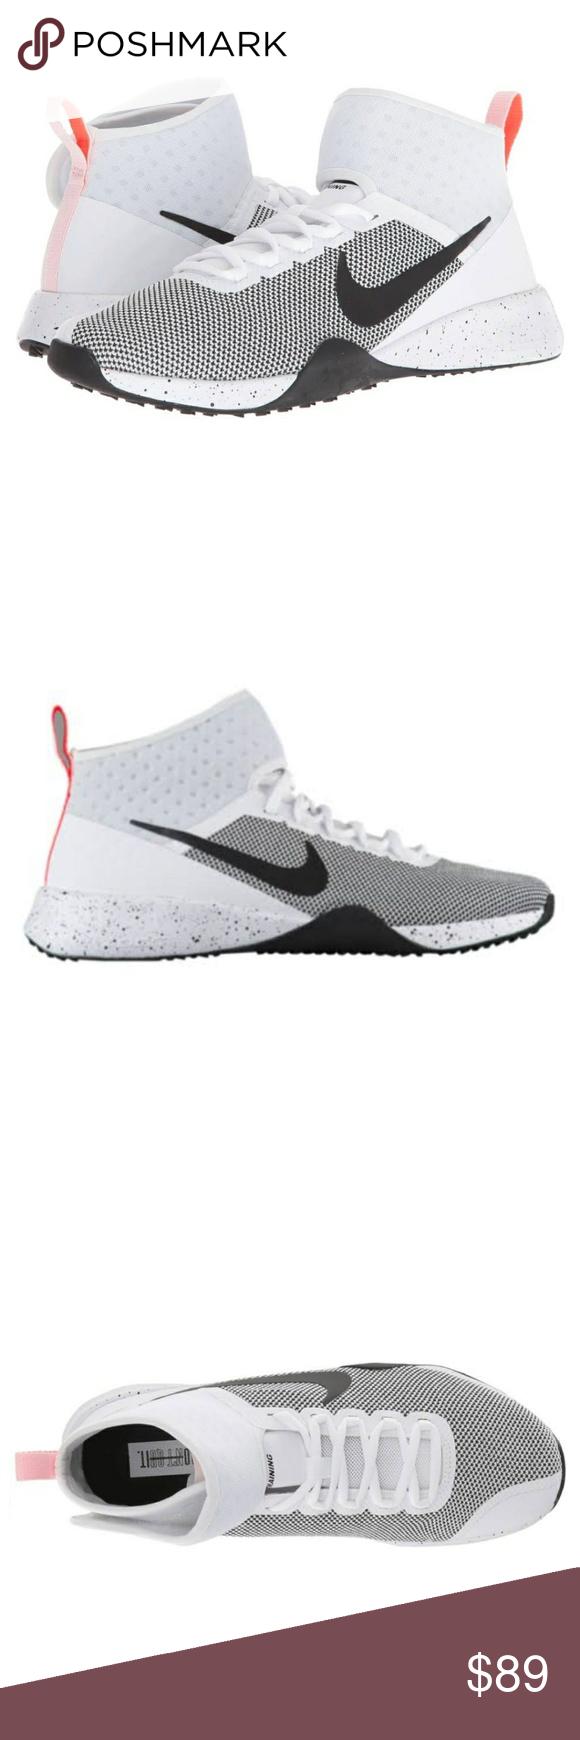 51c89b3c5b0 Womens Nike Air Zoom Strong 2 White Black Sz 6 NIKE Womens Nike Air Zoom